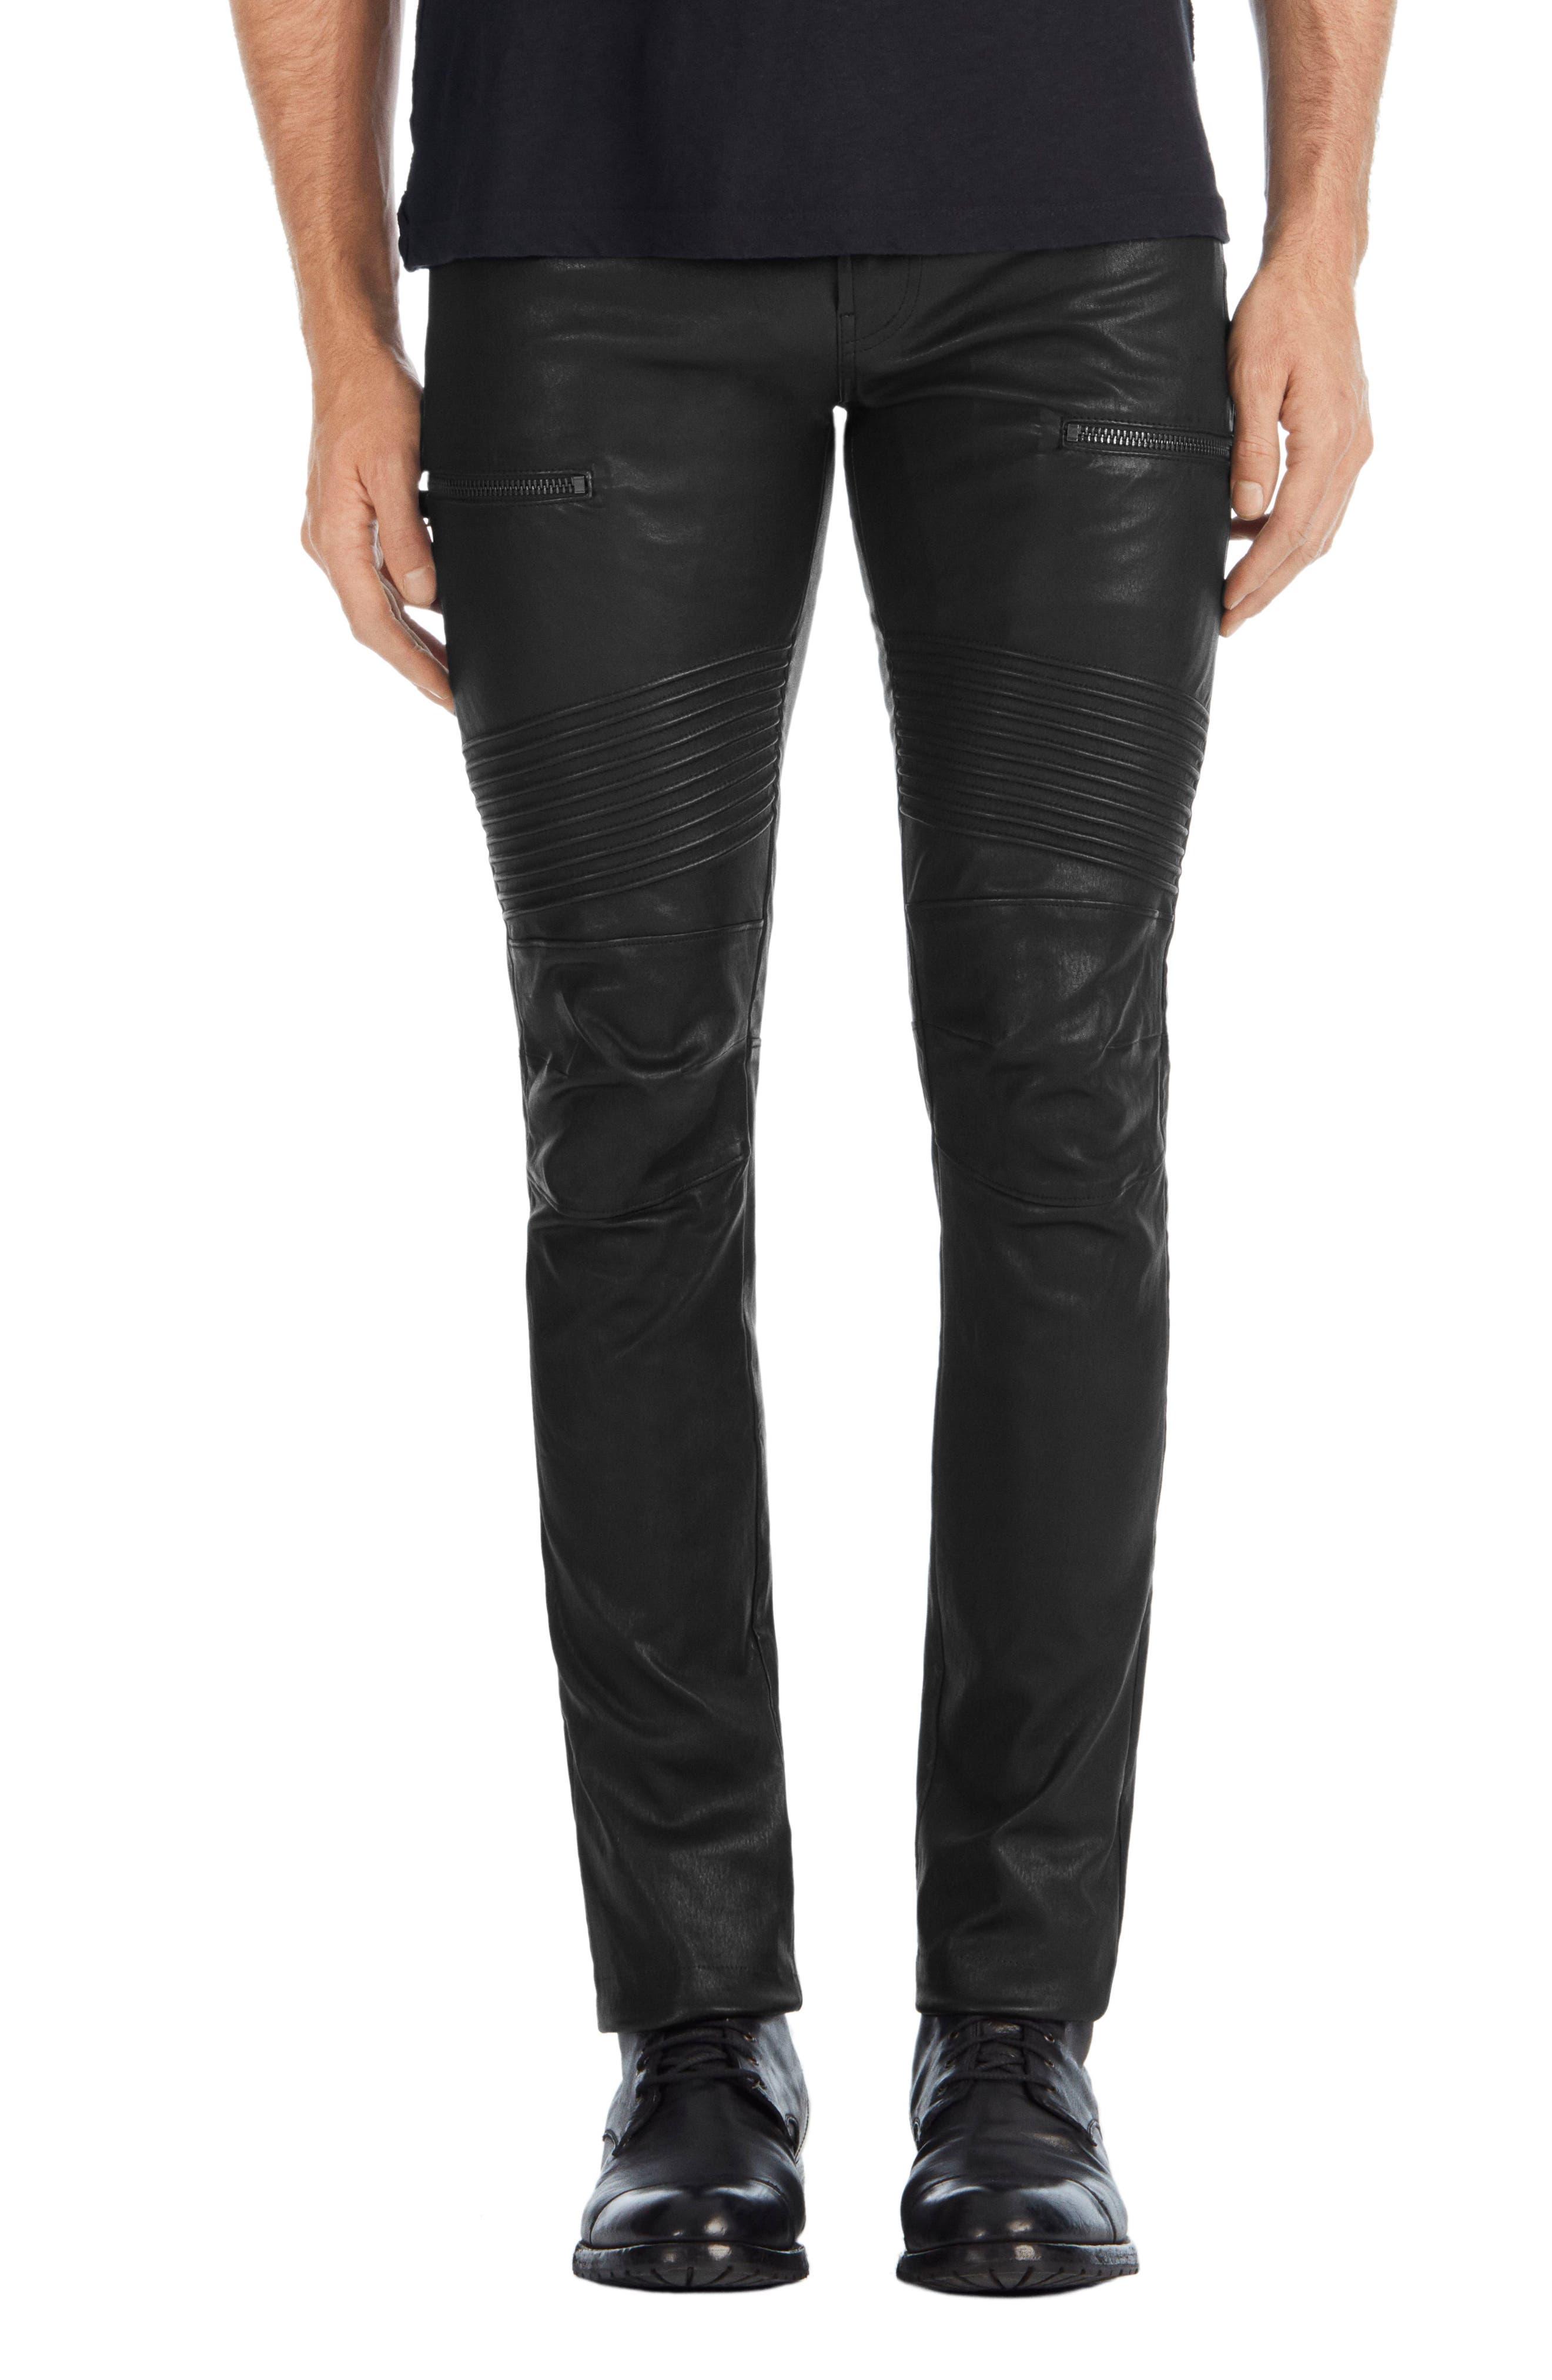 Acrux Skinny Leg Leather Pants,                         Main,                         color, Black